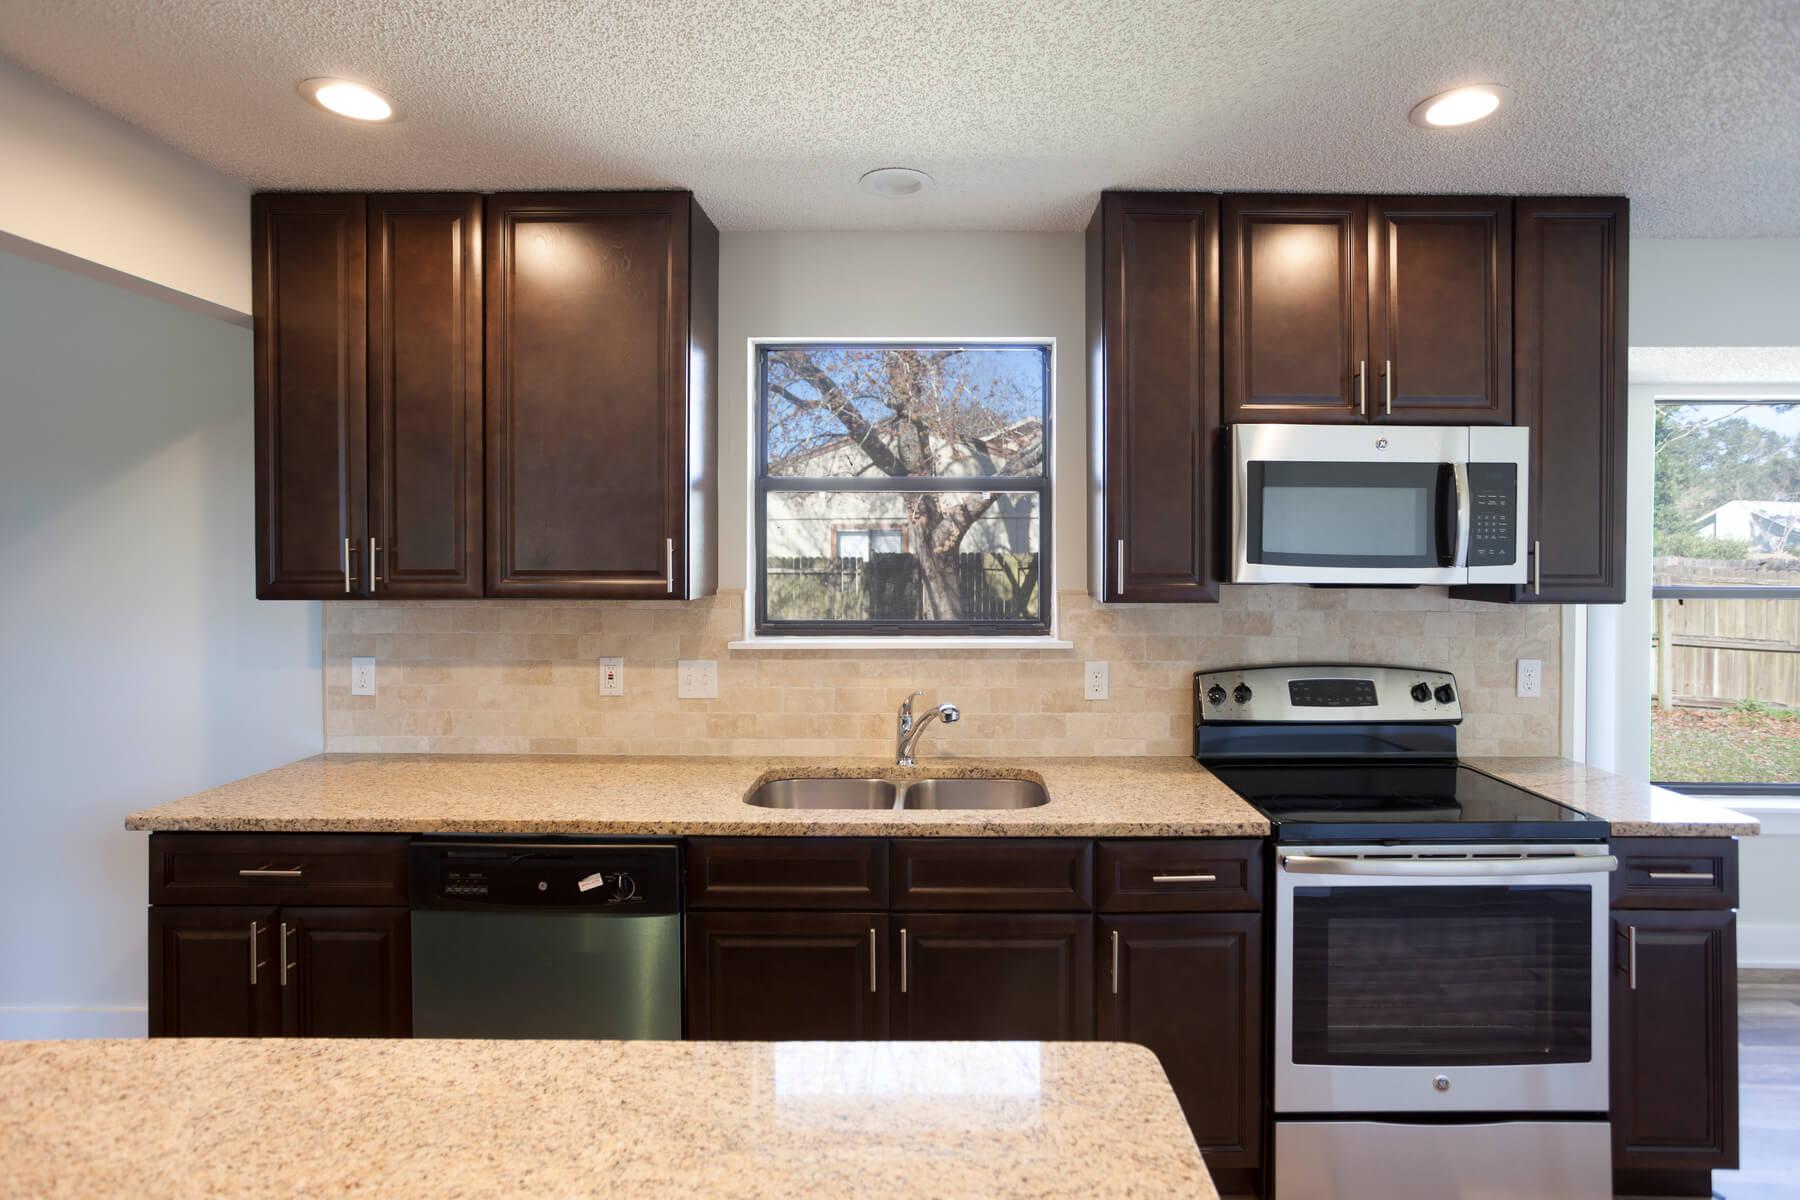 kitchens kitchen remodel jacksonville fl OVERVIEW